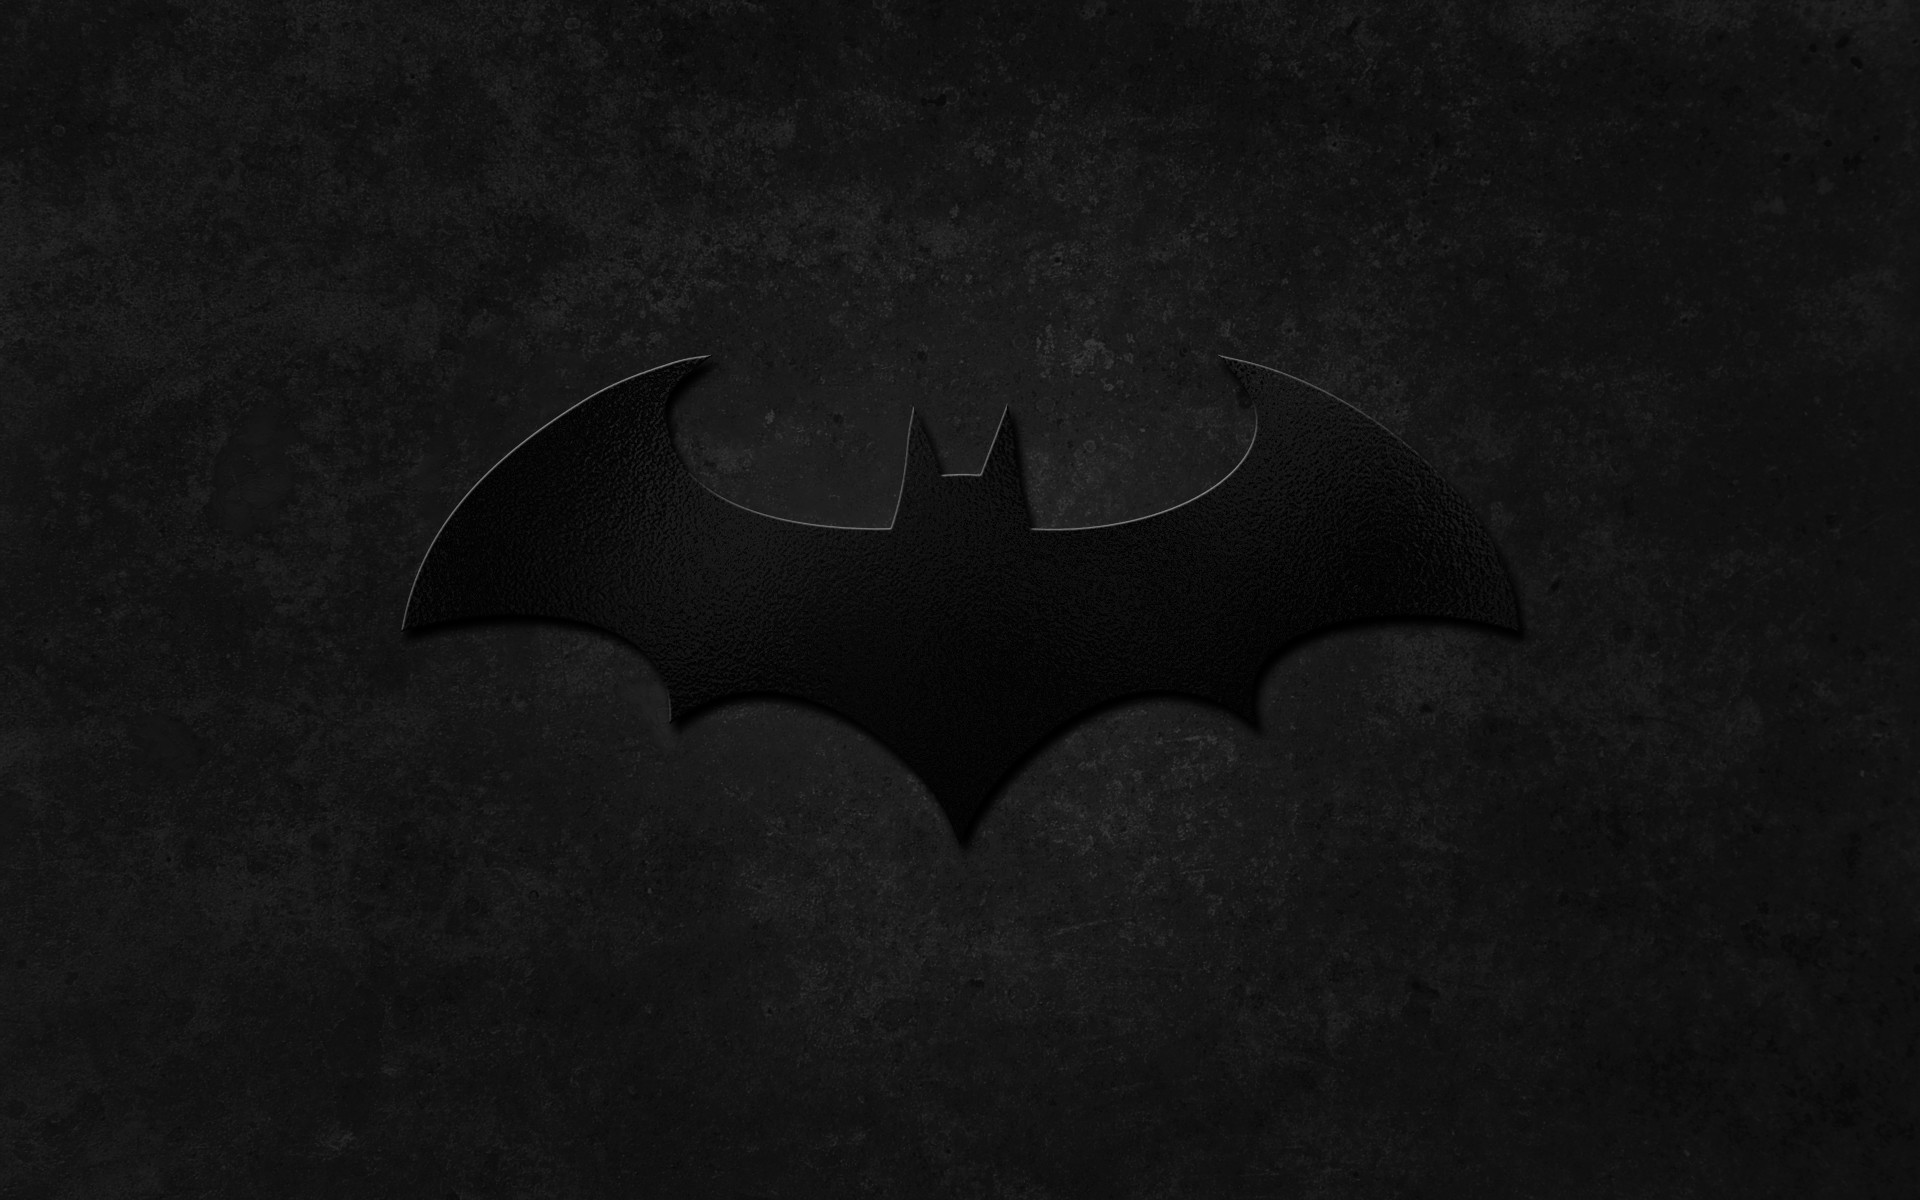 Batman Logo wallpapers For Free Download HD p | HD Wallpapers | Pinterest |  Wallpaper, Logos and Hd wallpaper